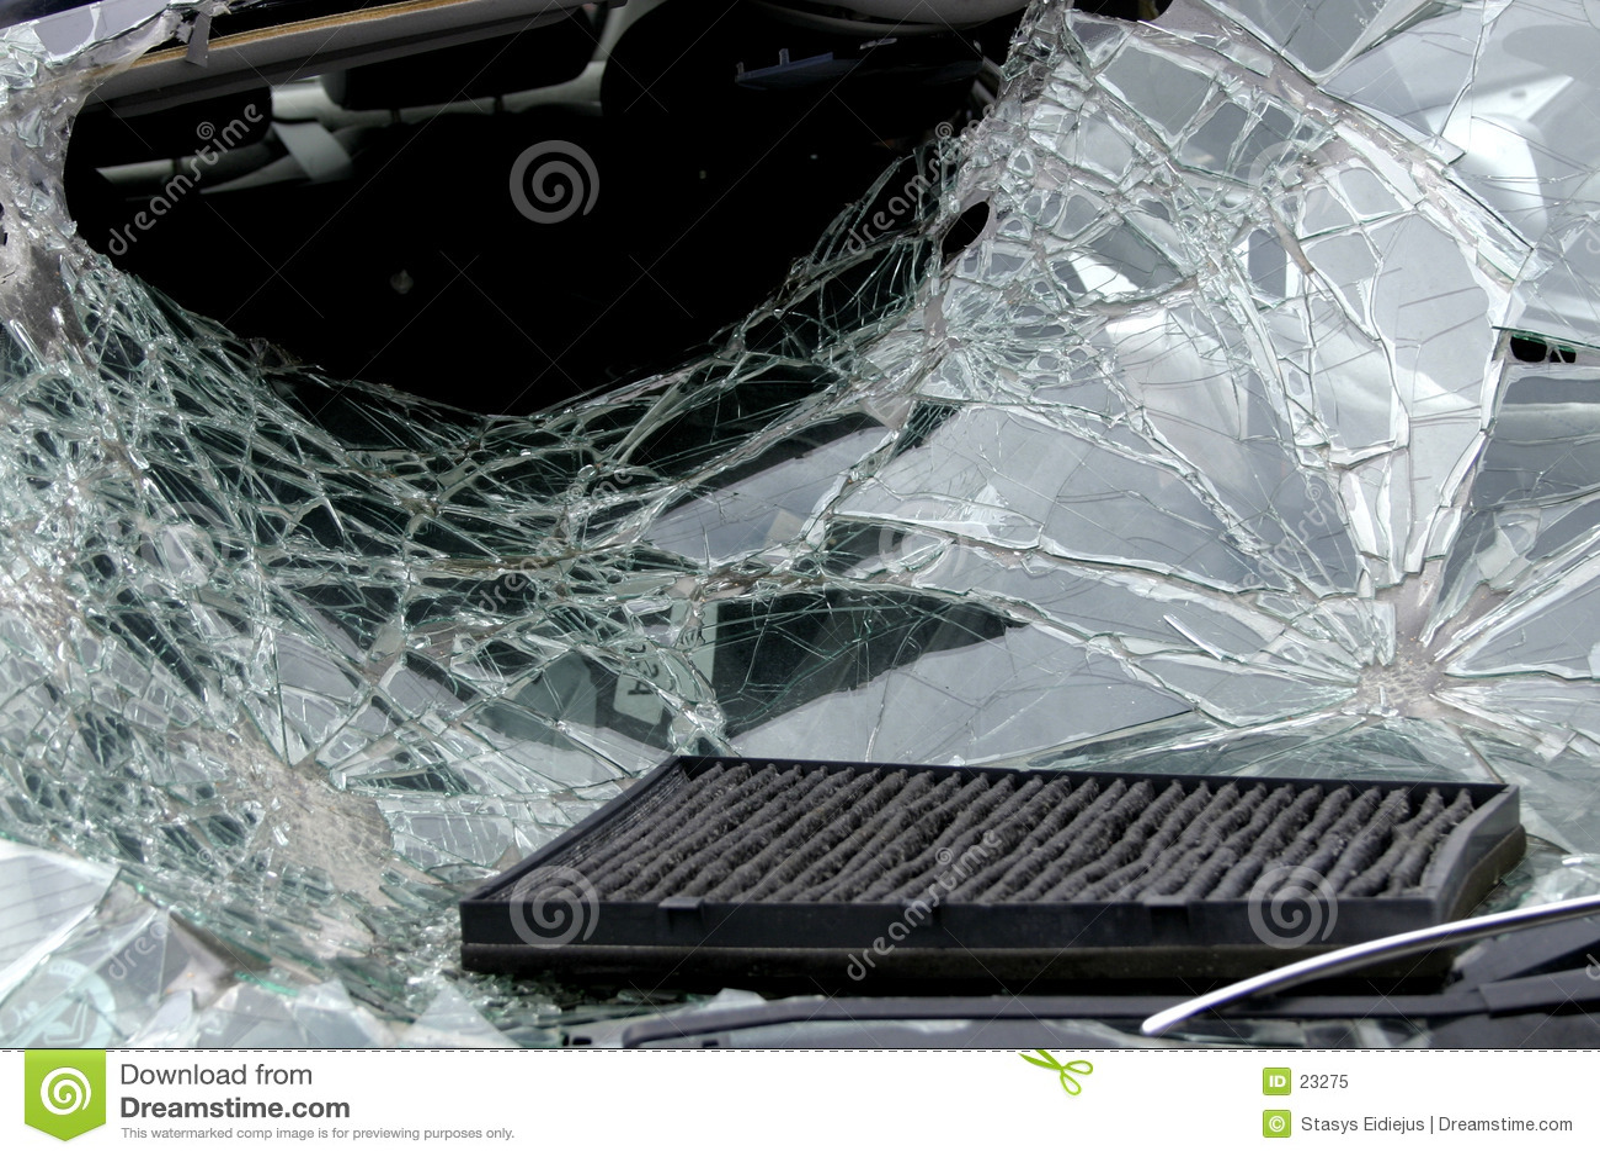 Accident IV